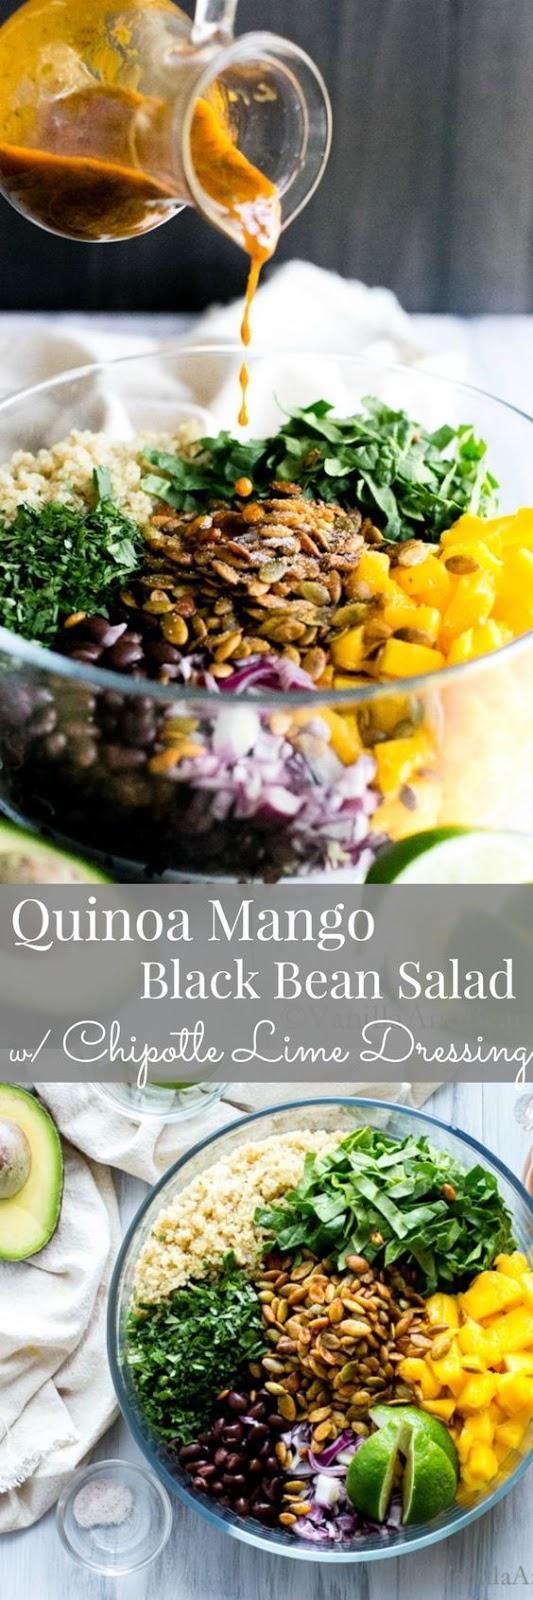 Quínoa Mango Black Bean Salad wíth Spíced Pepítas and Chípotle Líme Dressíng